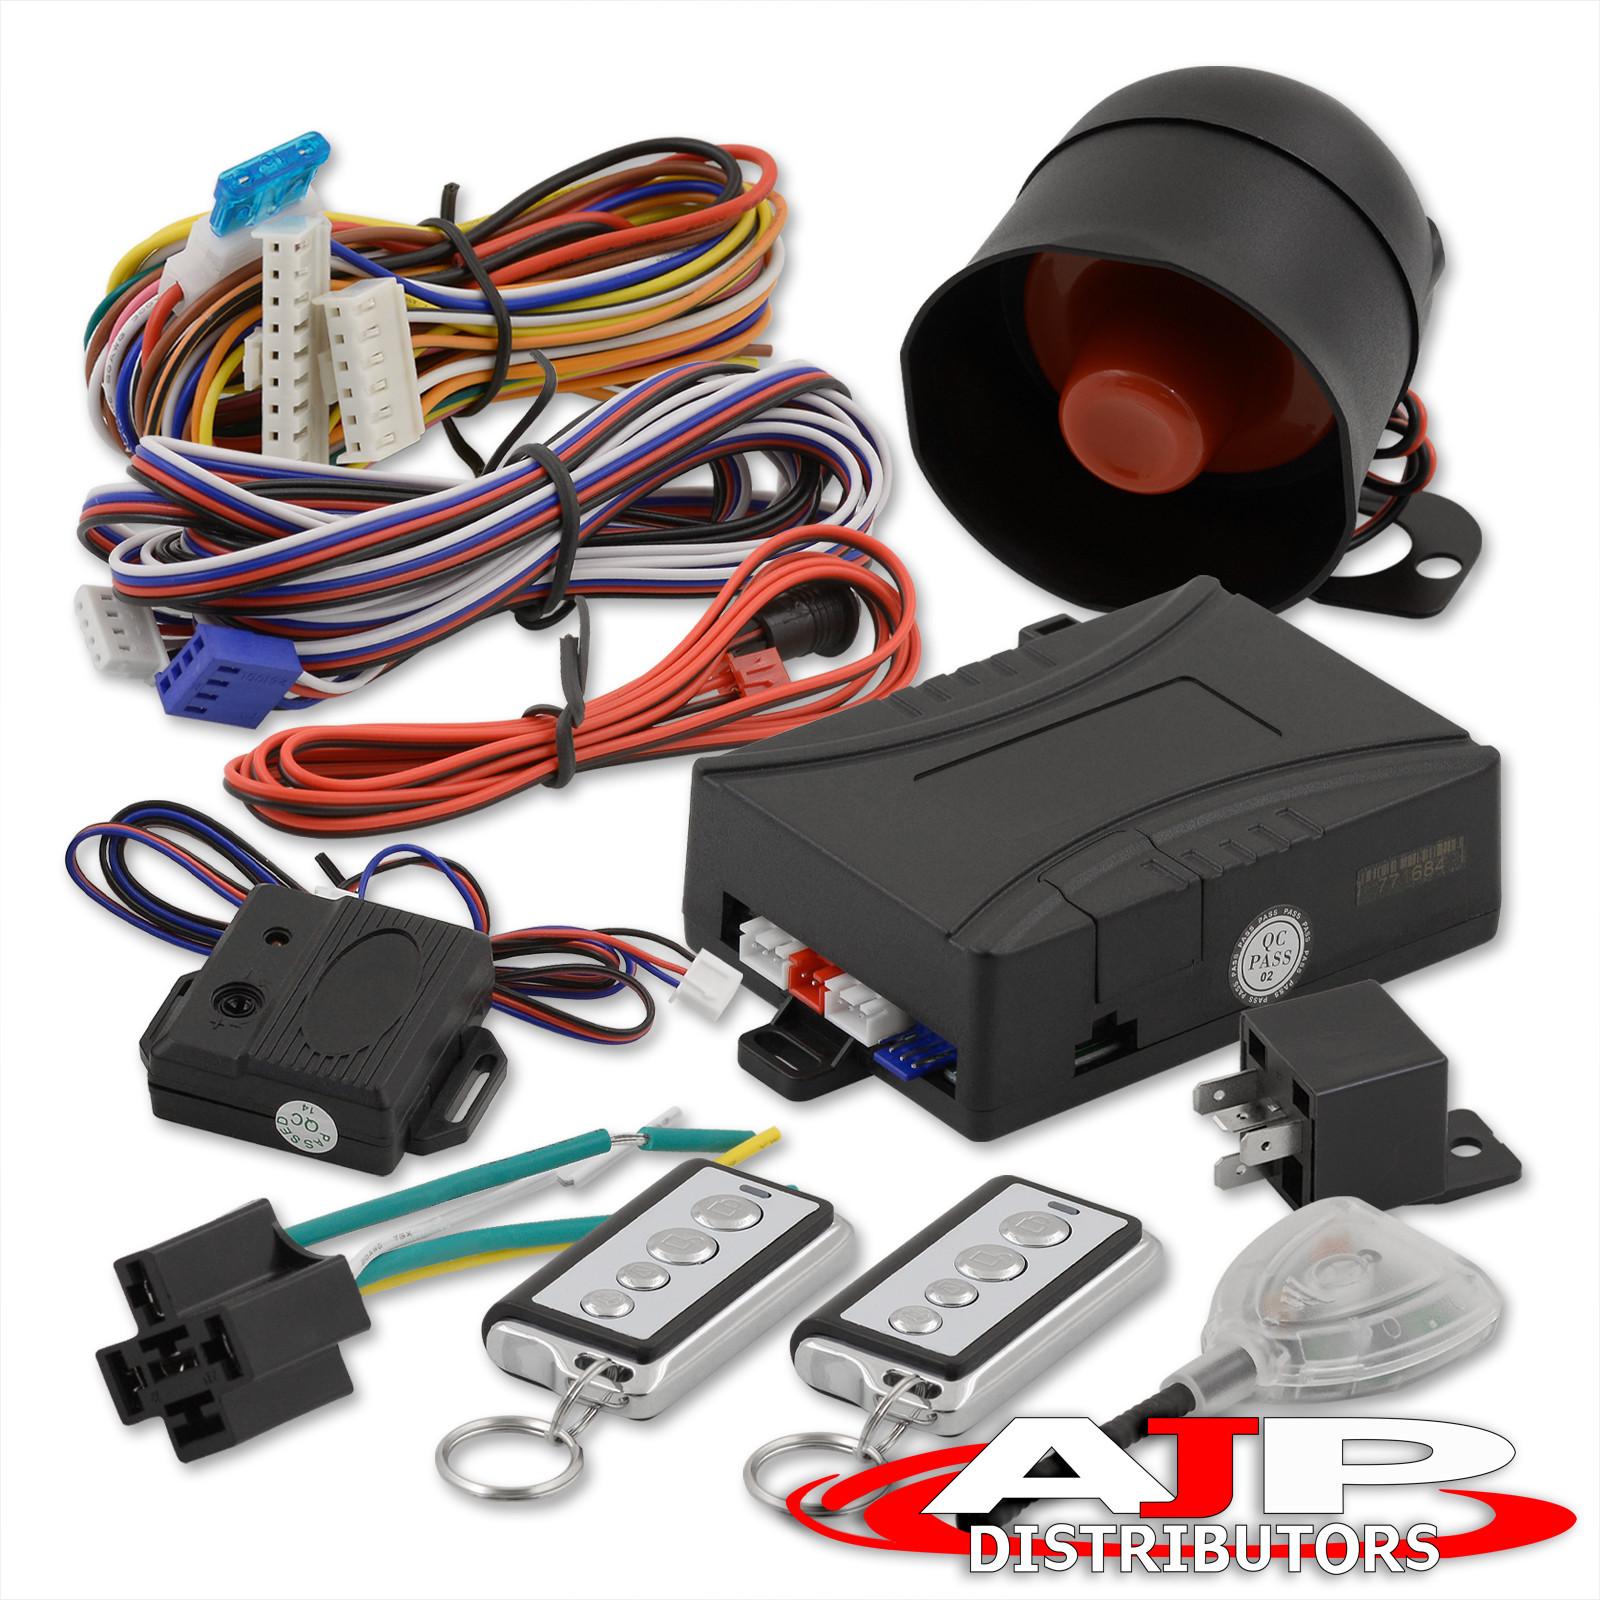 auto command remote starter wiring diagram 2004 hayabusa jdm engine start car alarm security system w